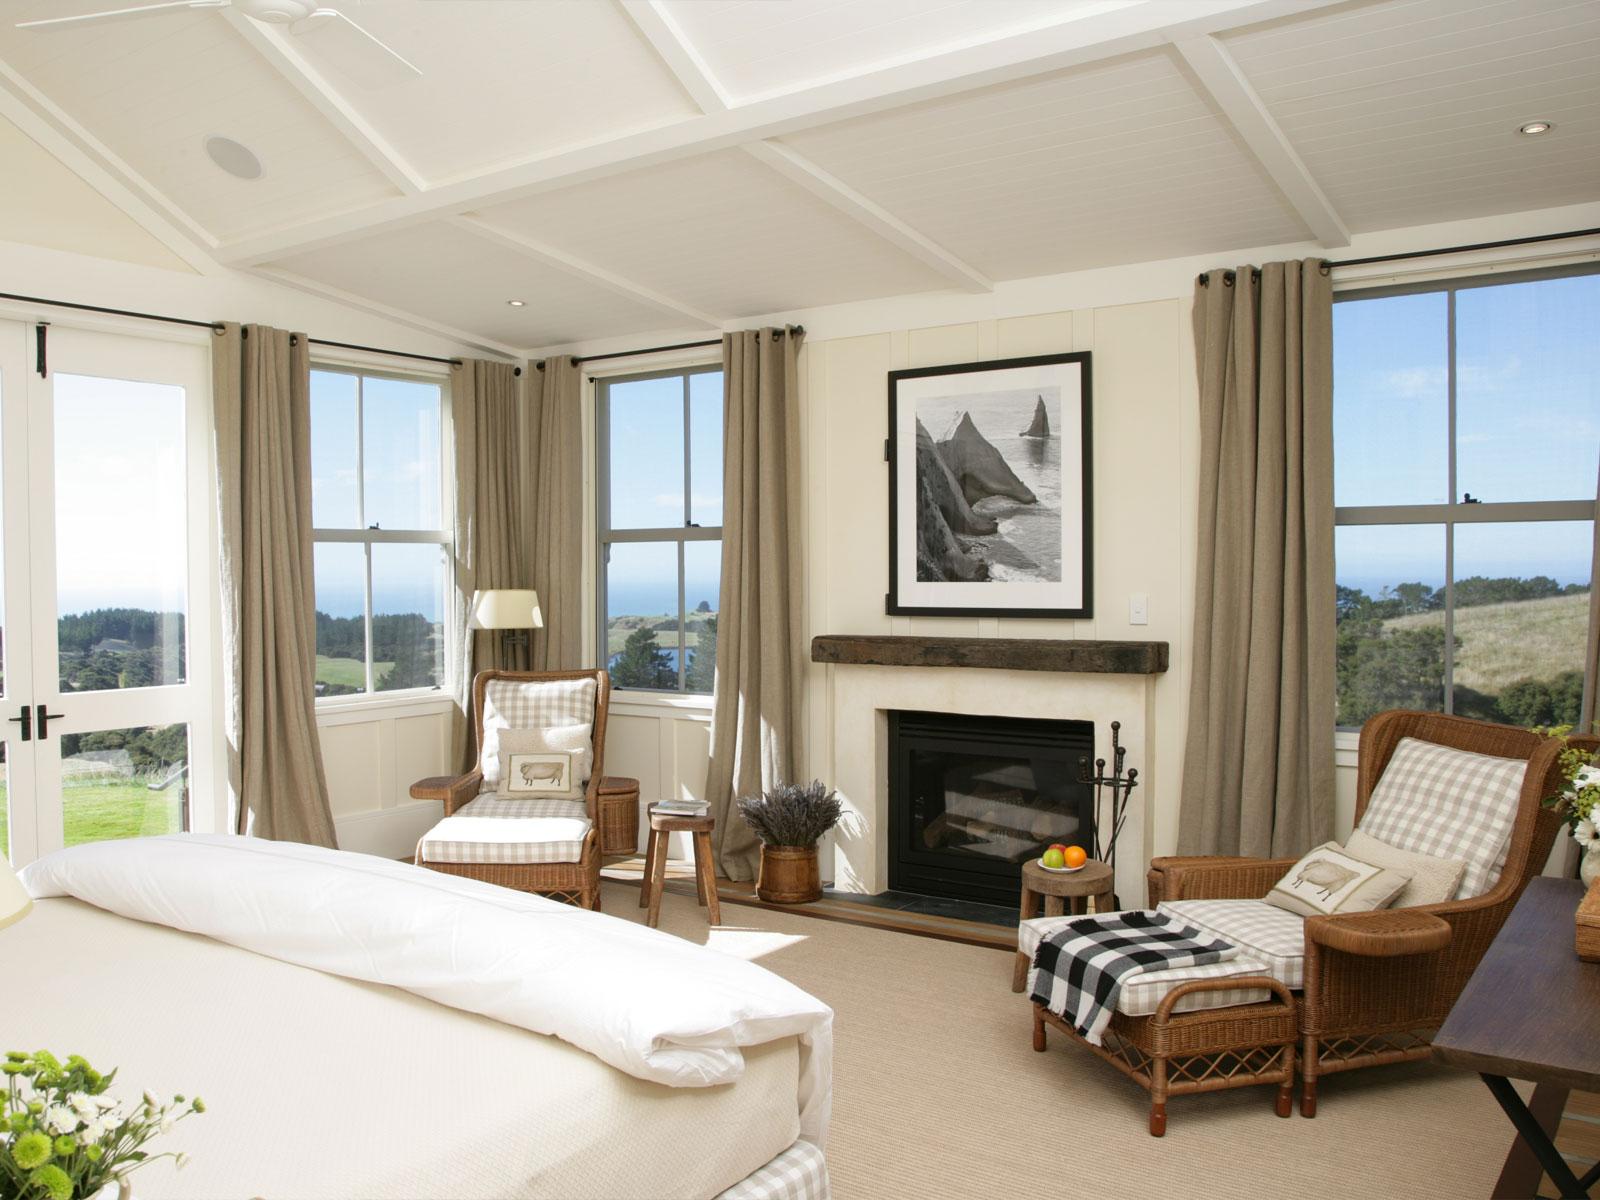 Inspiring Golf Landscapes of New Zealand